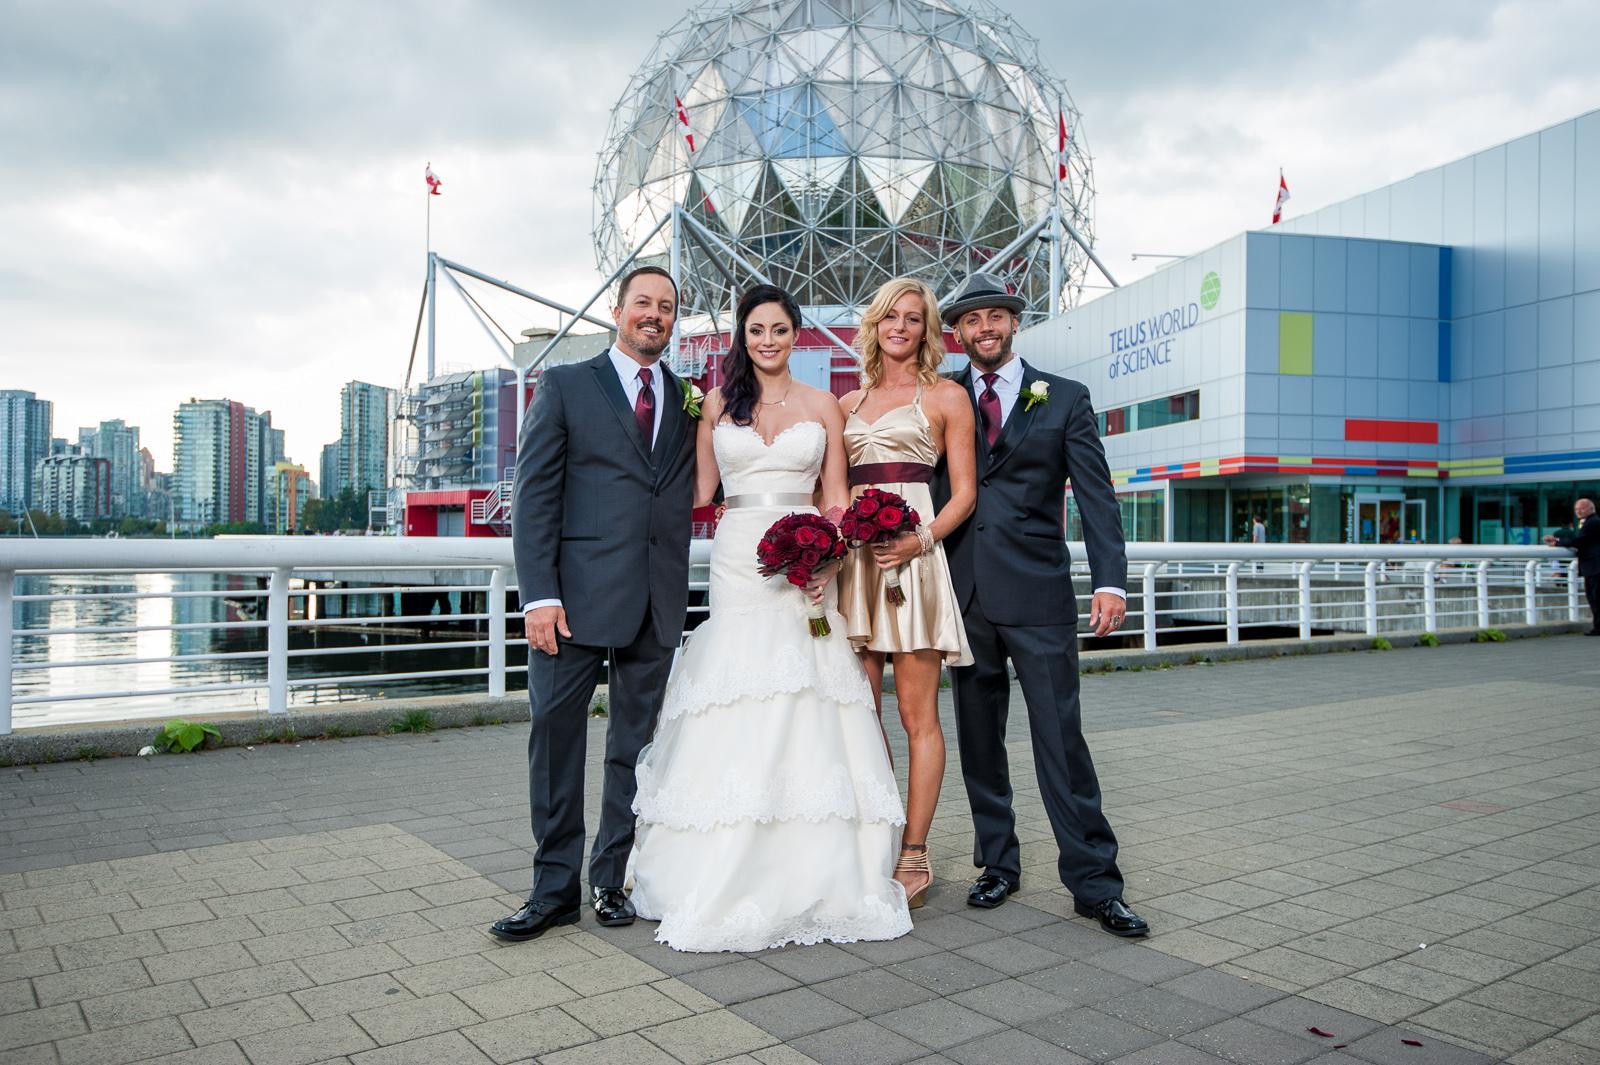 victoria-wedding-photographers-science-world-wedding-telus-world-of-science-wedding-33.jpg